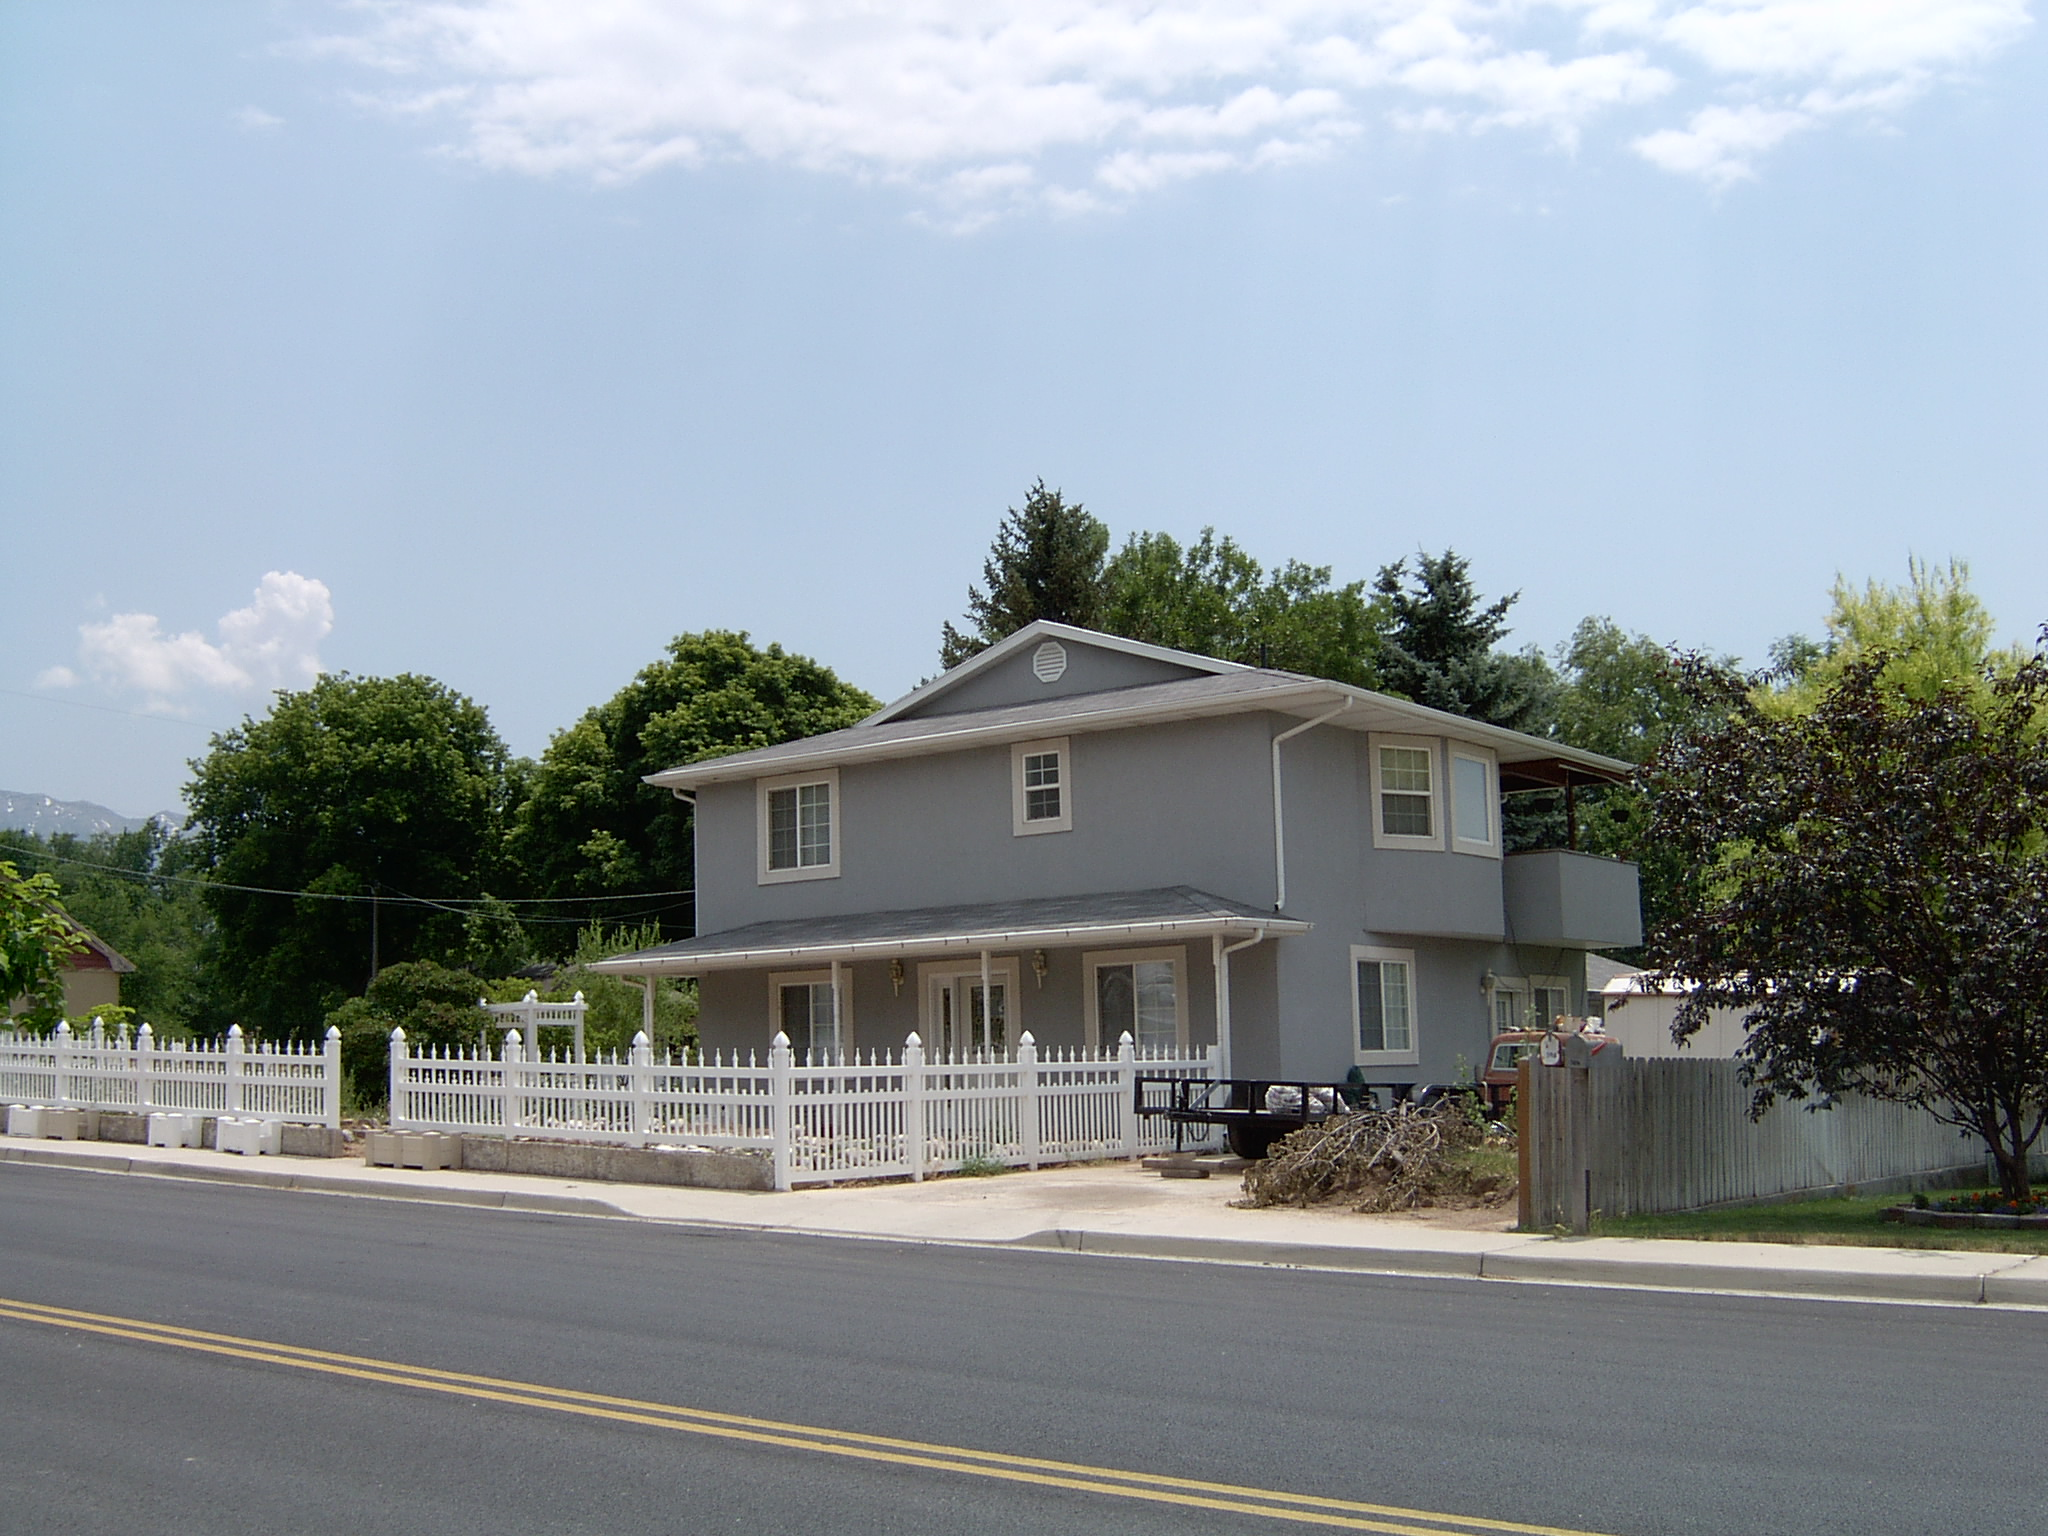 2005-1577P.JPG